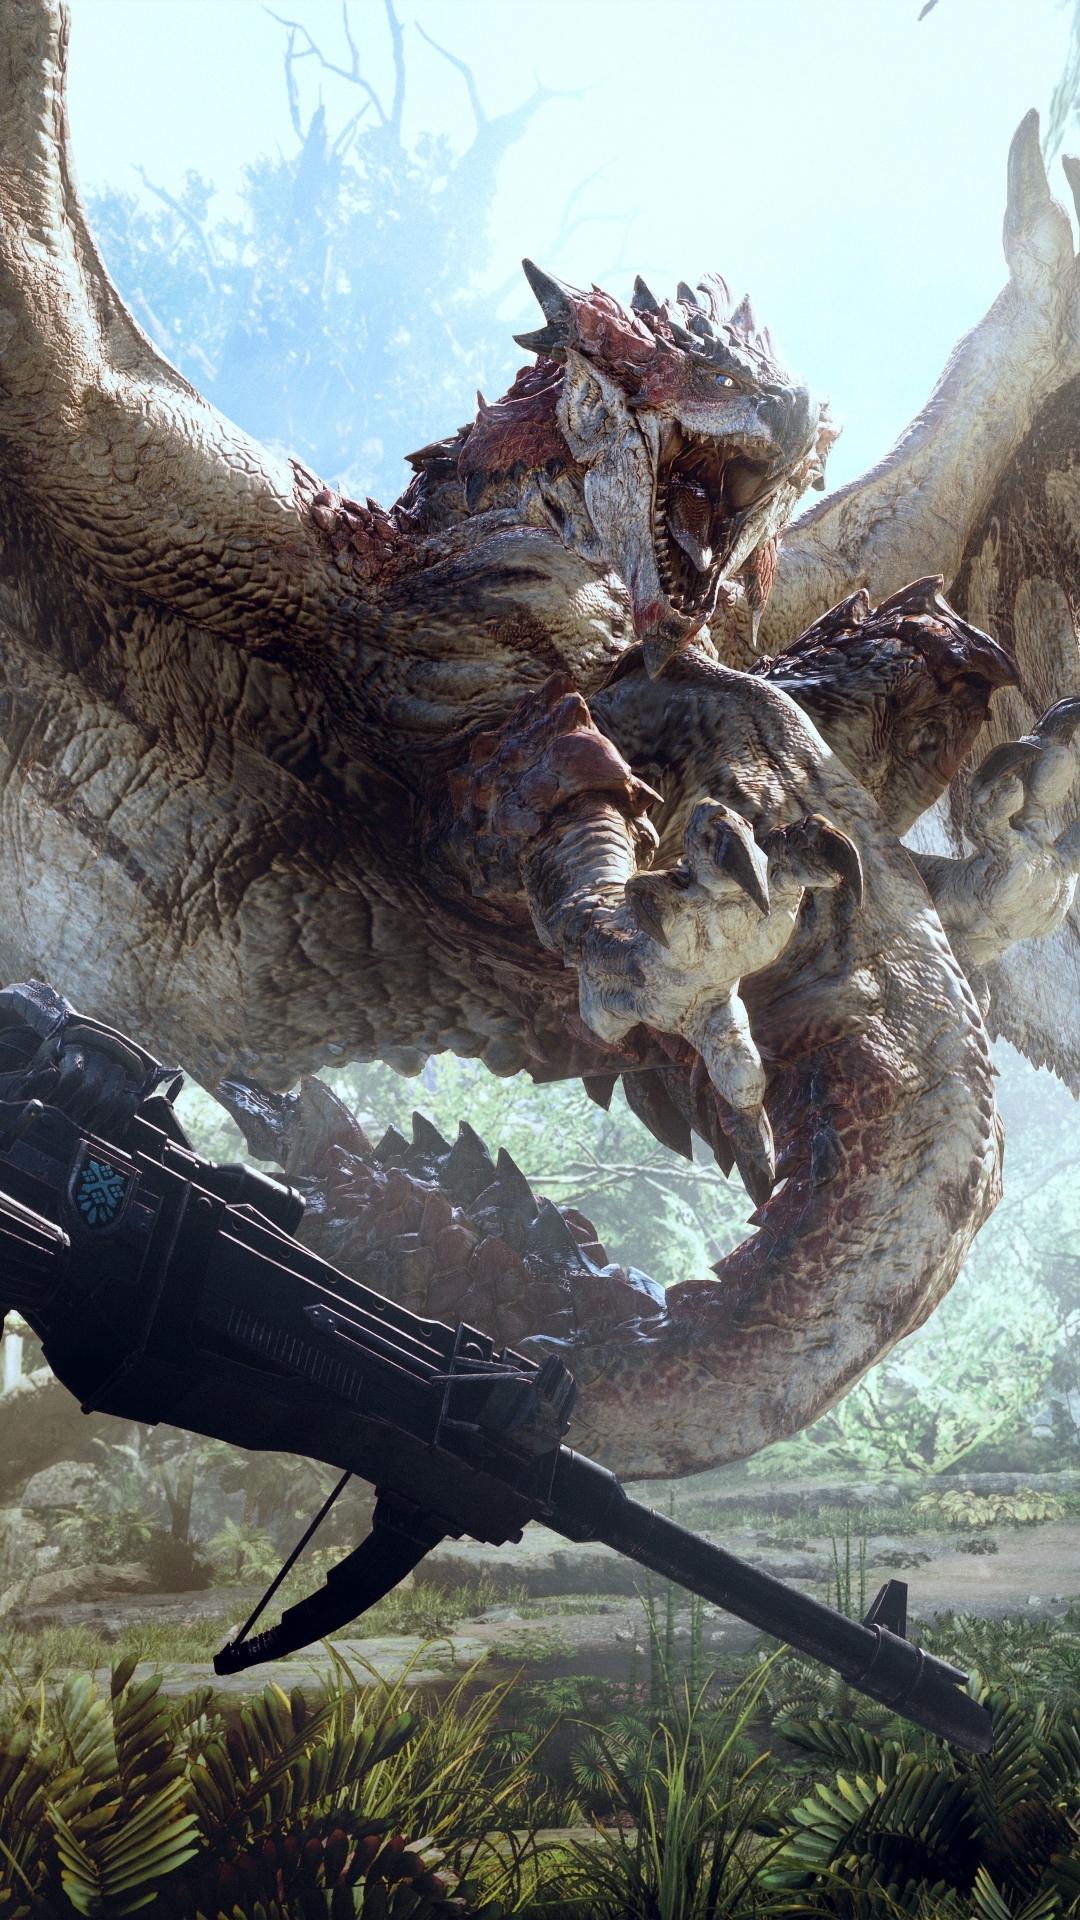 video game/monster hunter: world (1080x1920) wallpaper id: 686071